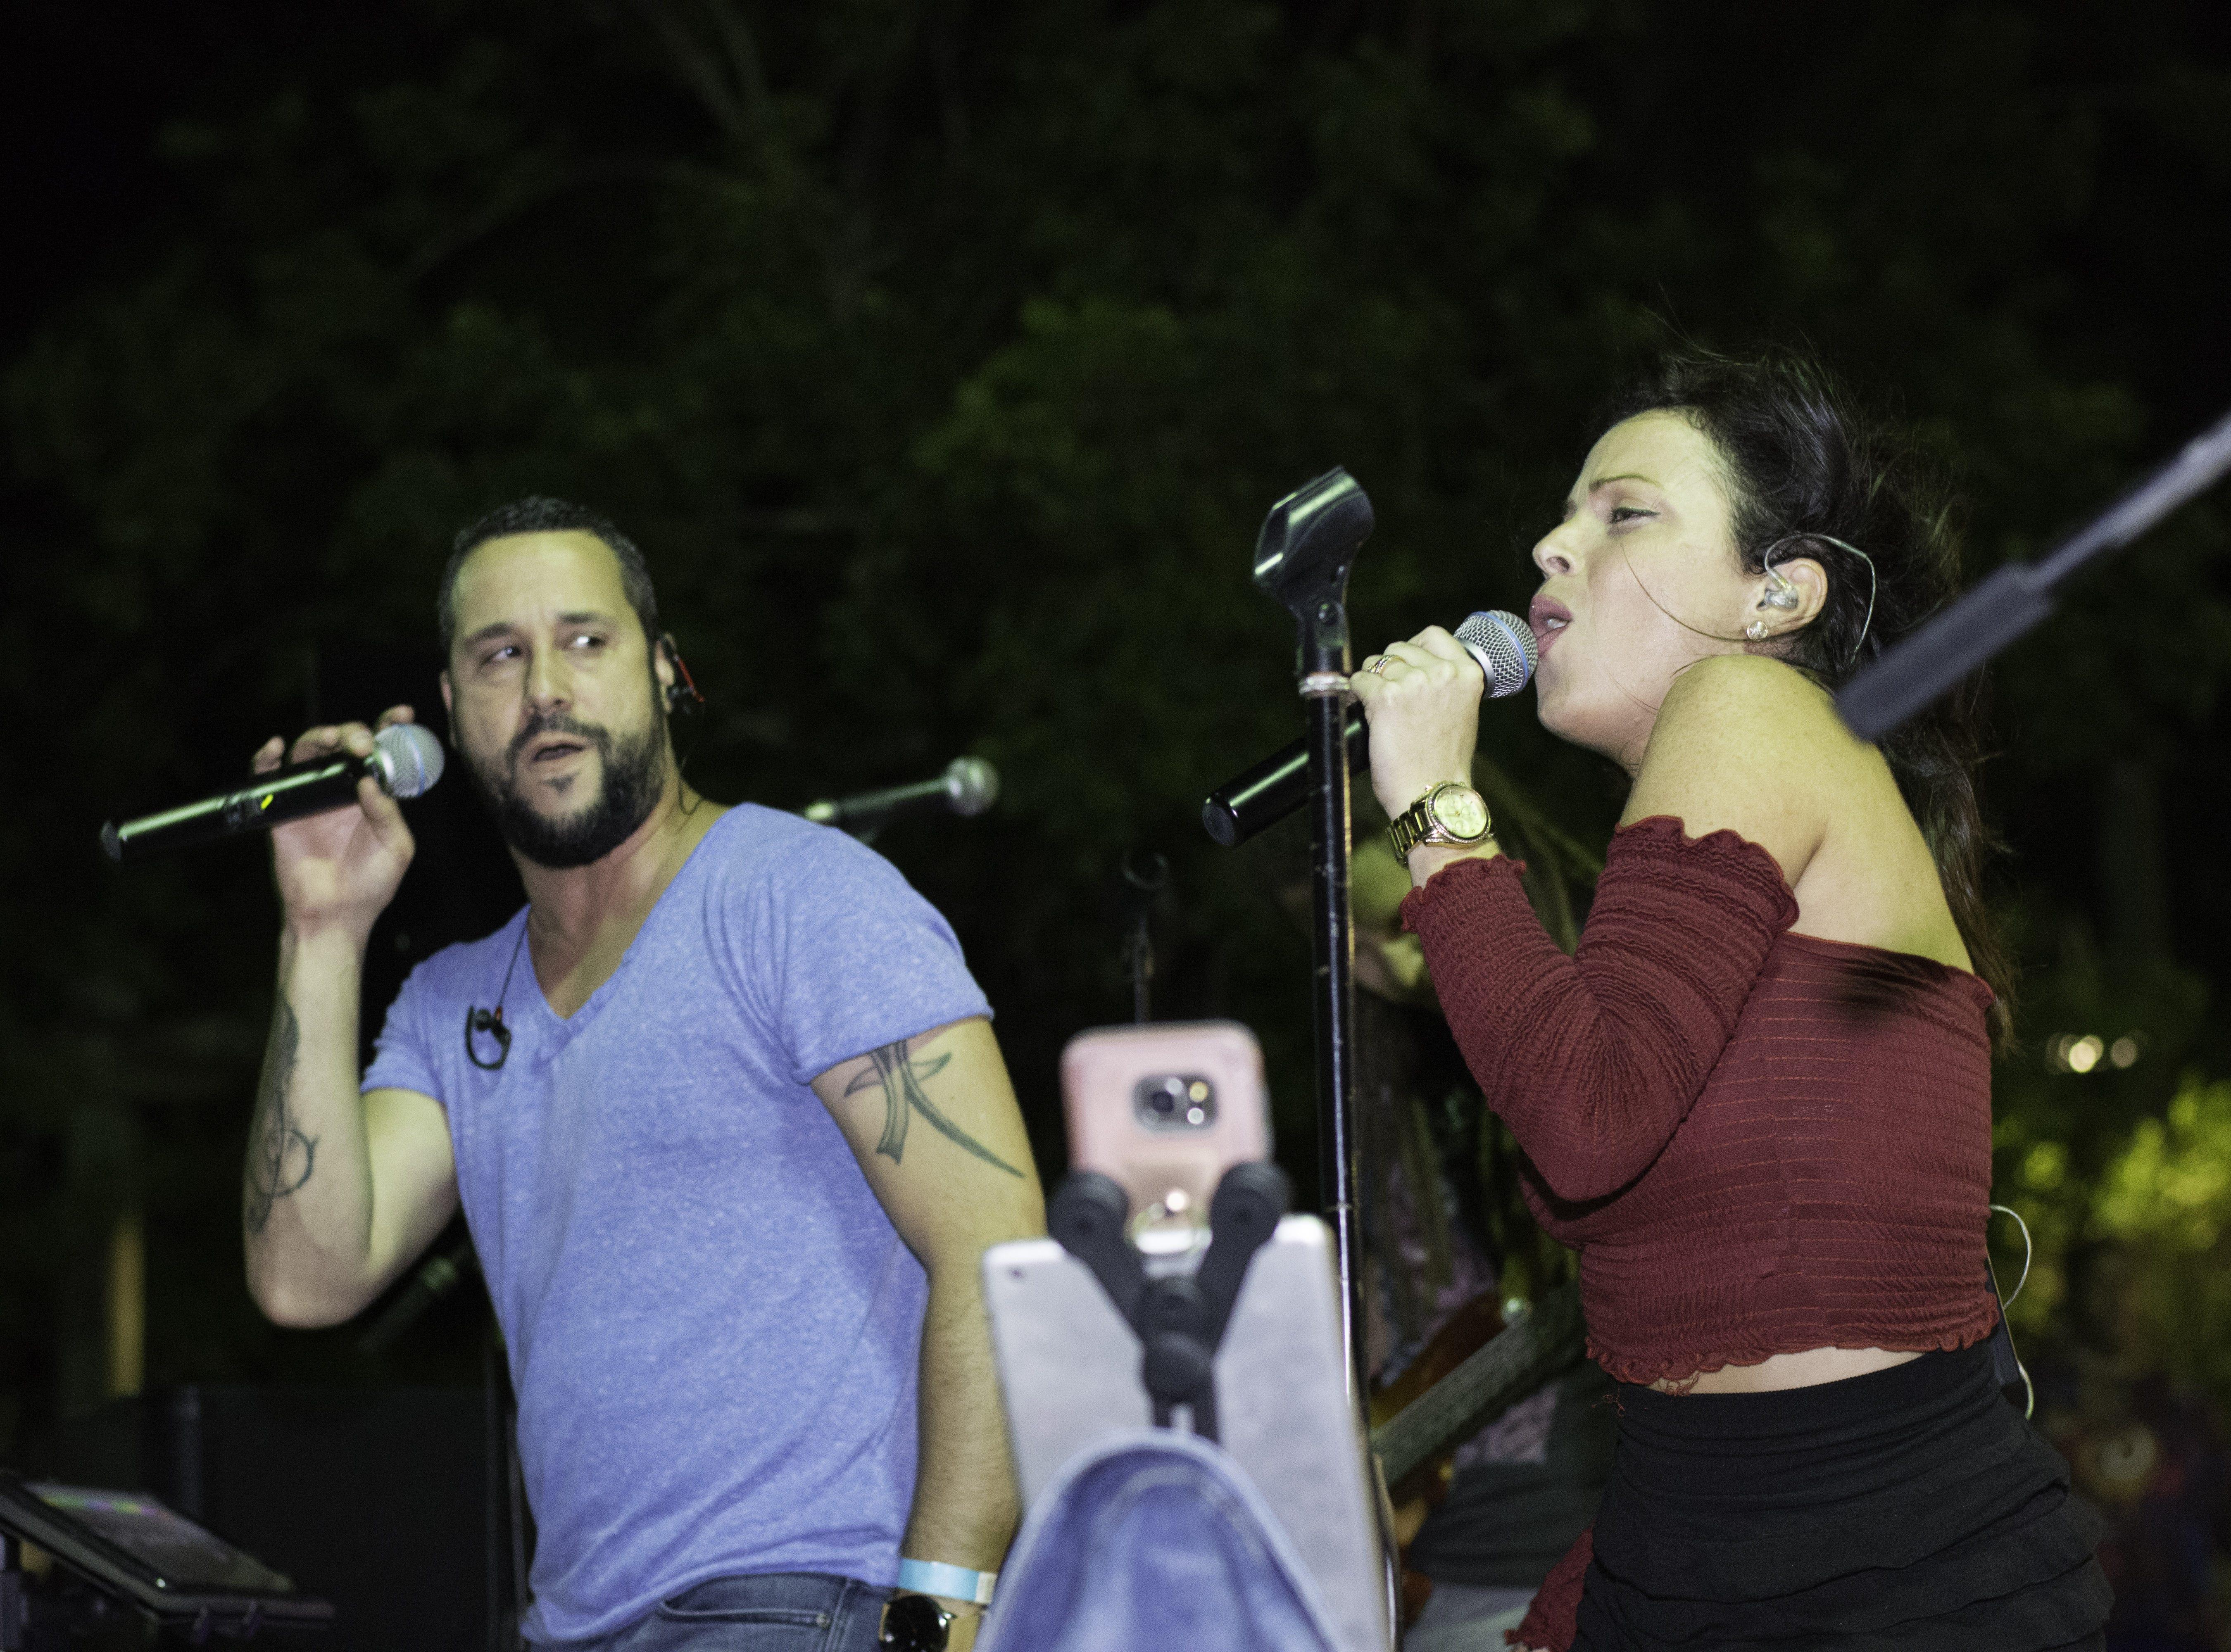 Wonderama performing at the Top 40 music venue at Jazzoo. Arron Lampkin/For FLORIDA TODAY